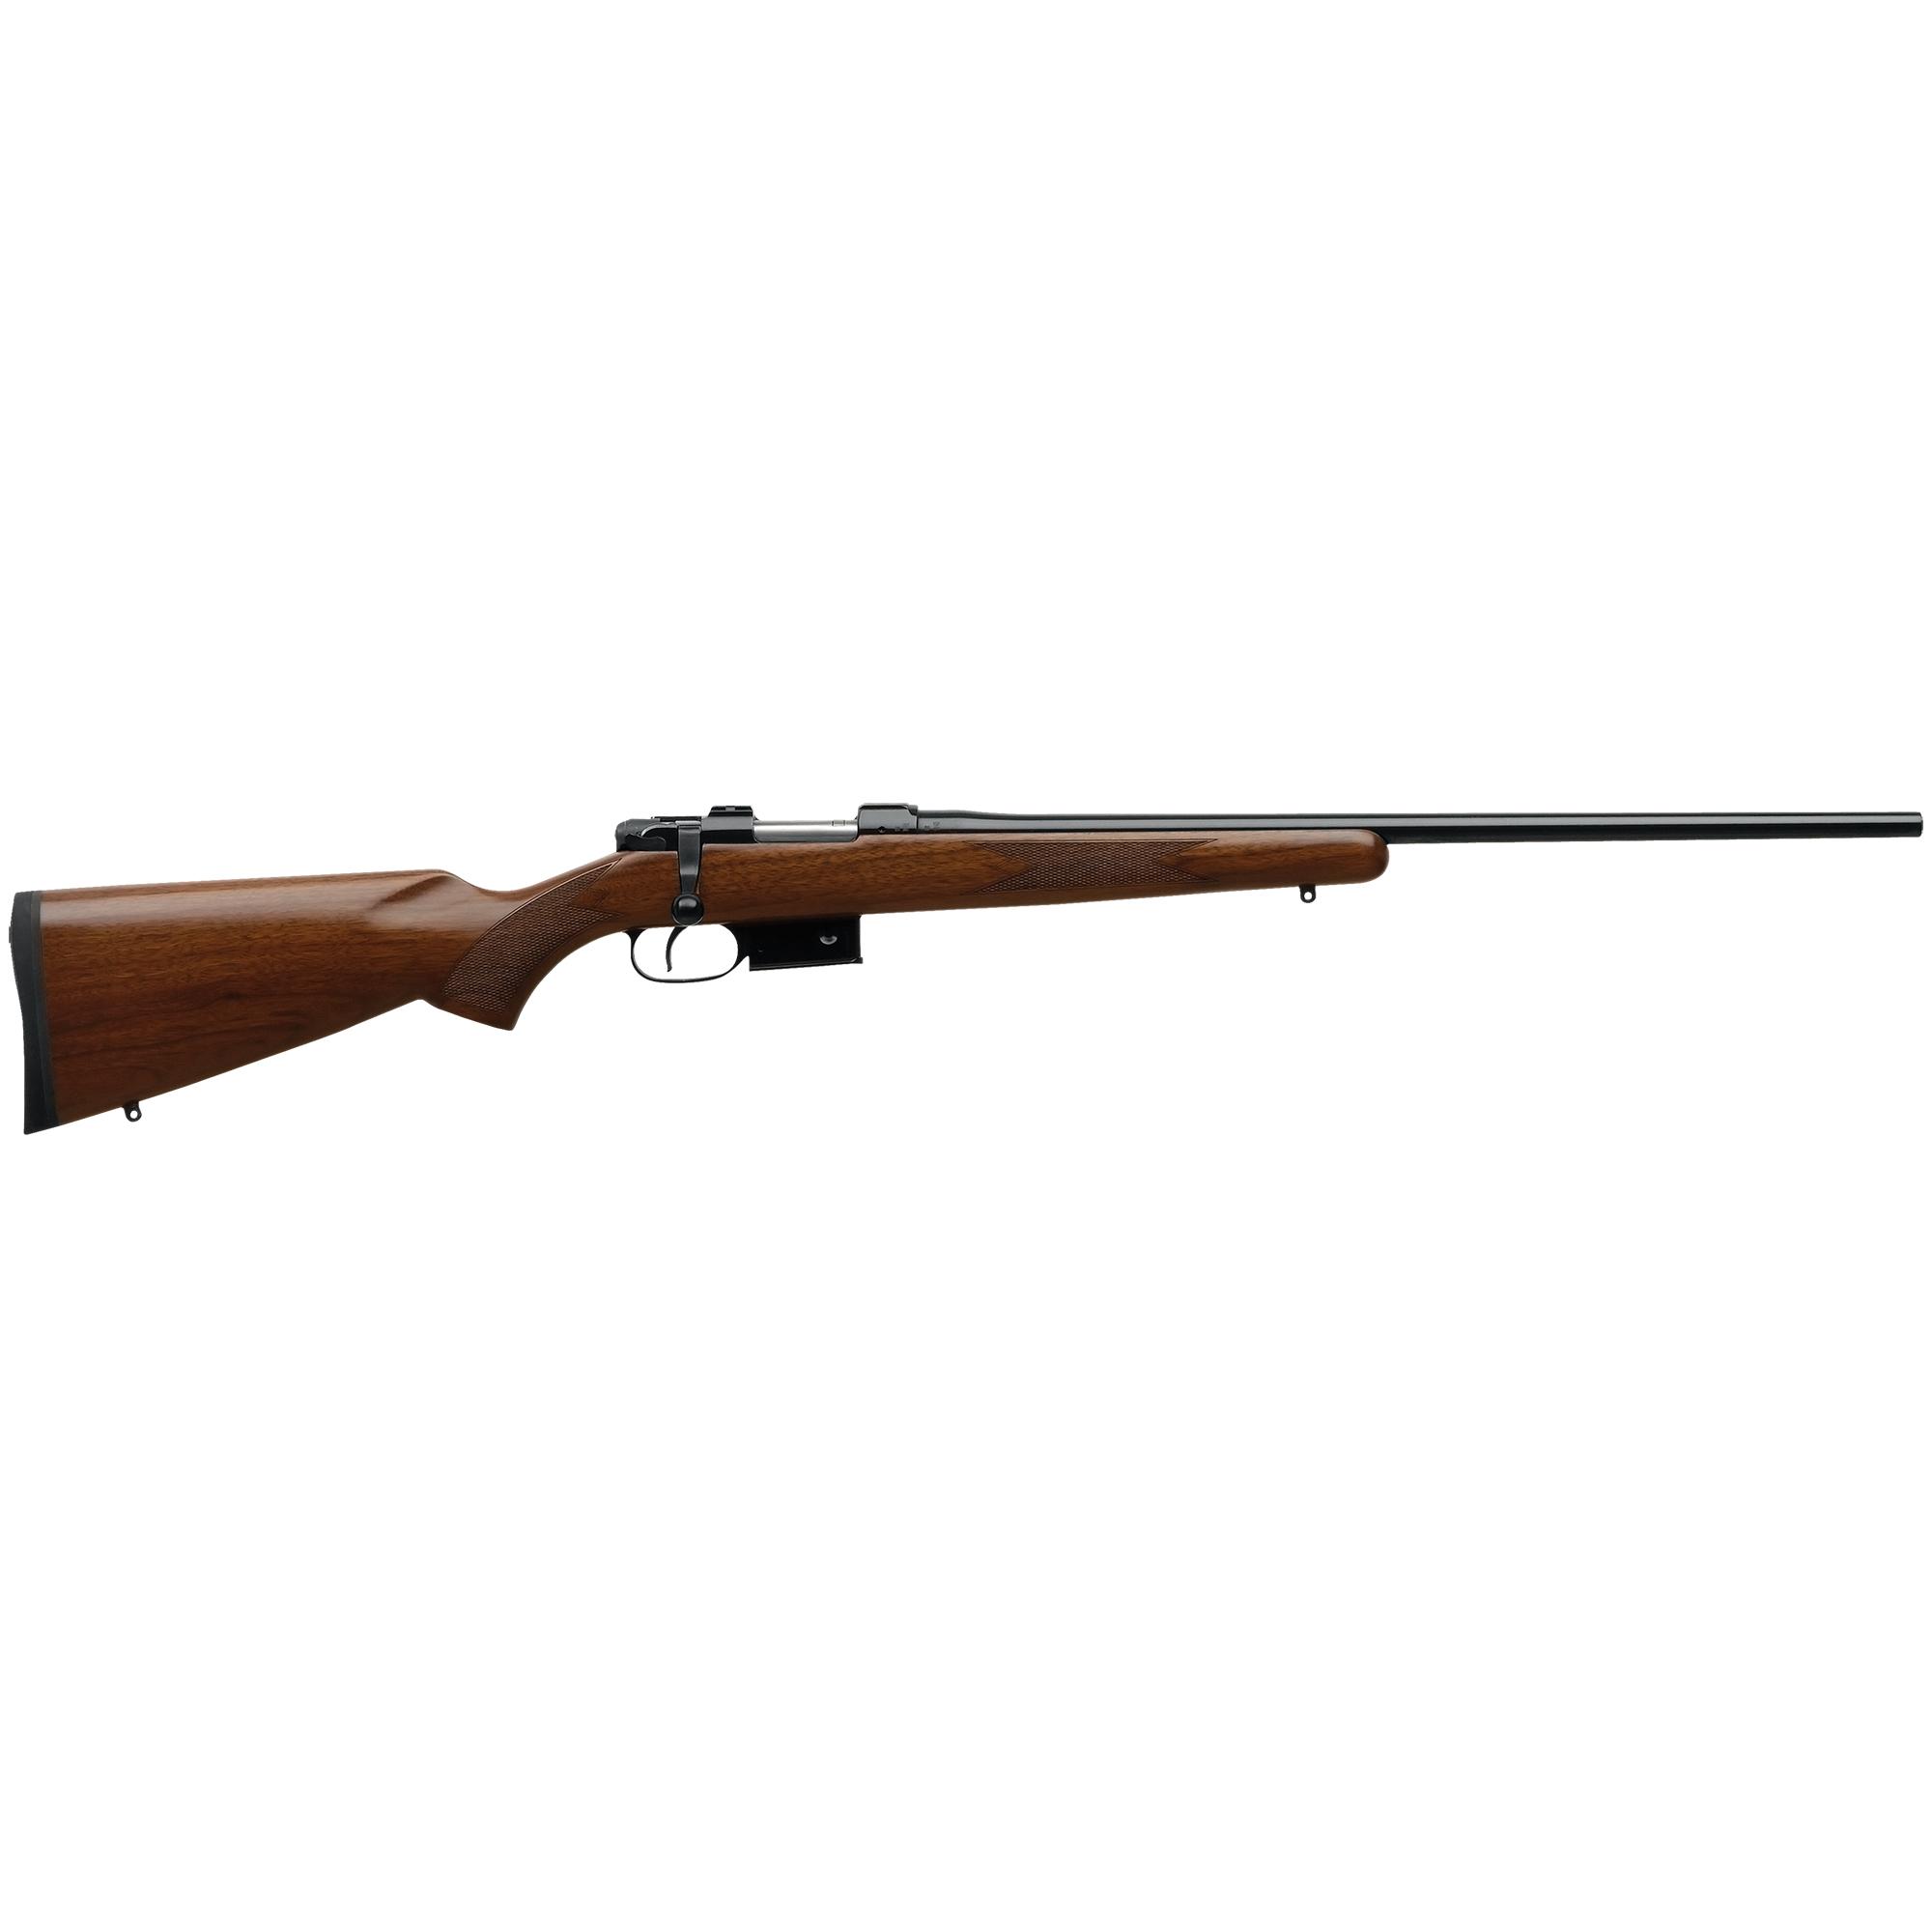 CZ-USA CZ 527 American Centerfire Rifle, .22 Hornet